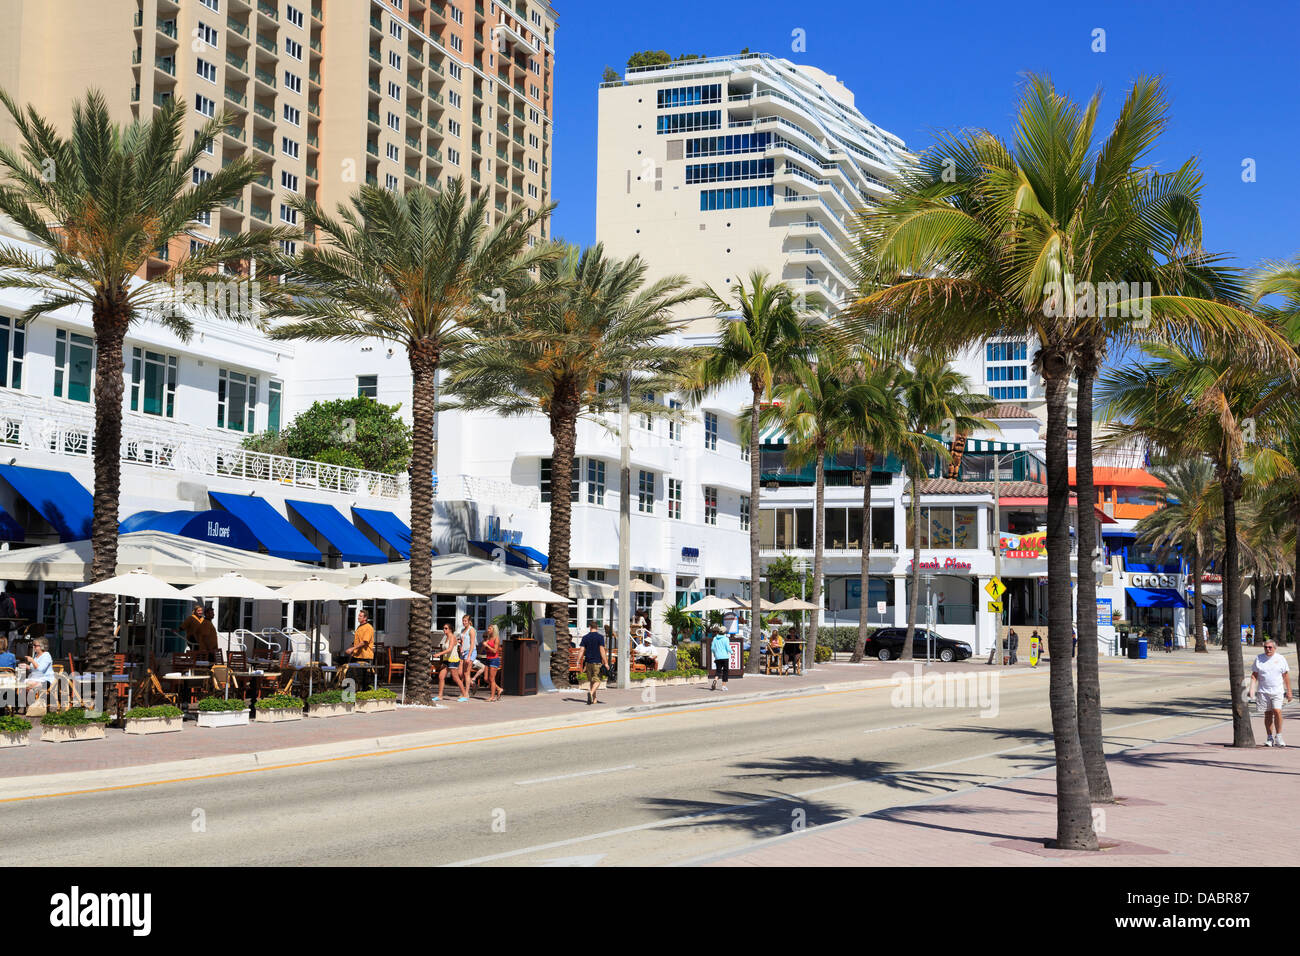 Ocean Boulevard, Fort Lauderdale, Florida, United States of America, North America Stock Photo